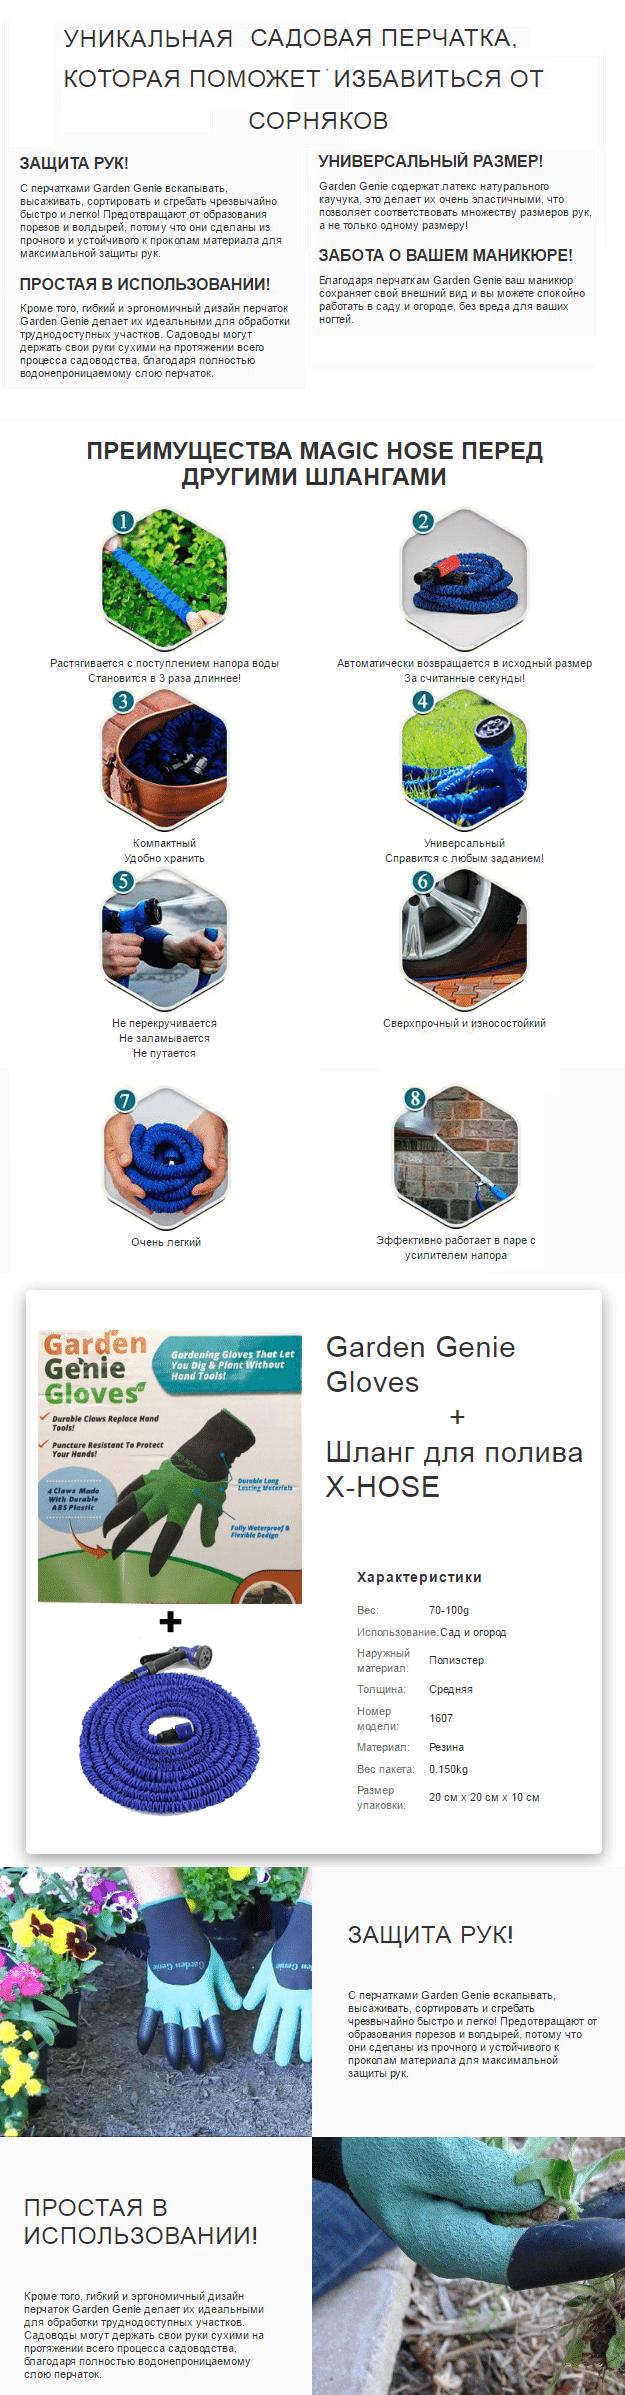 Садовая перчатка Garden Genie Gloves + Шланг X-Hose купить